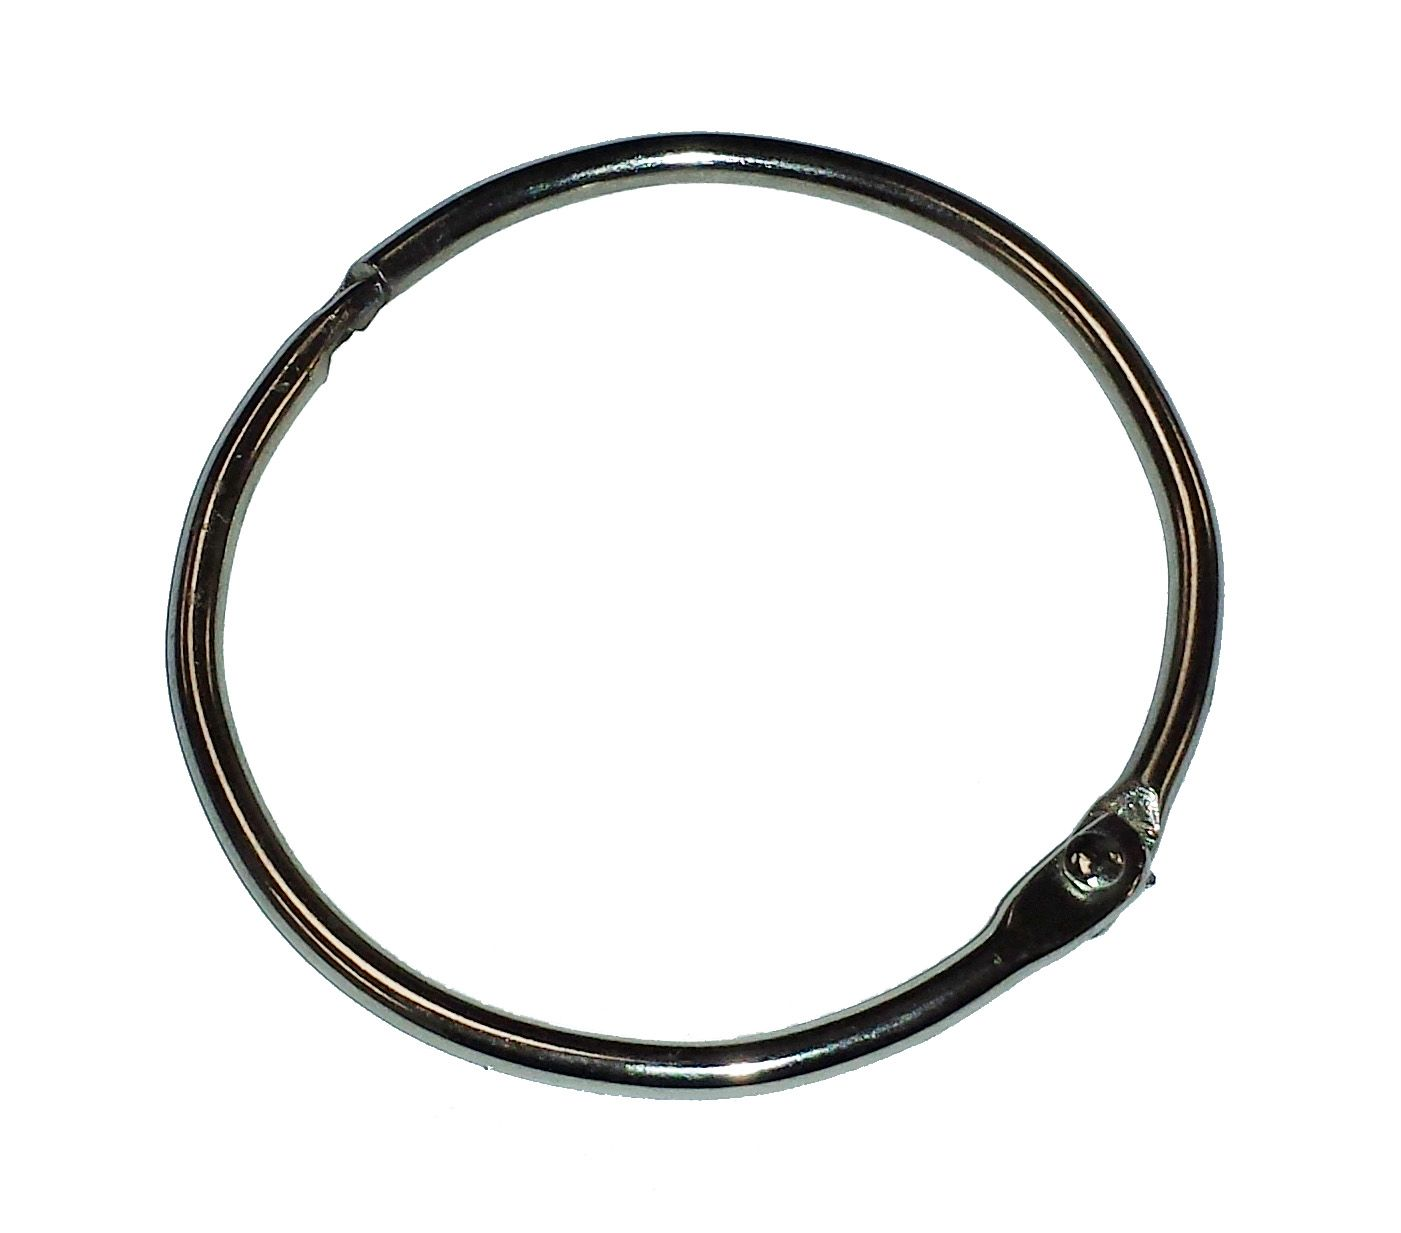 PK 10 Parweld P3610 Curtain Ring